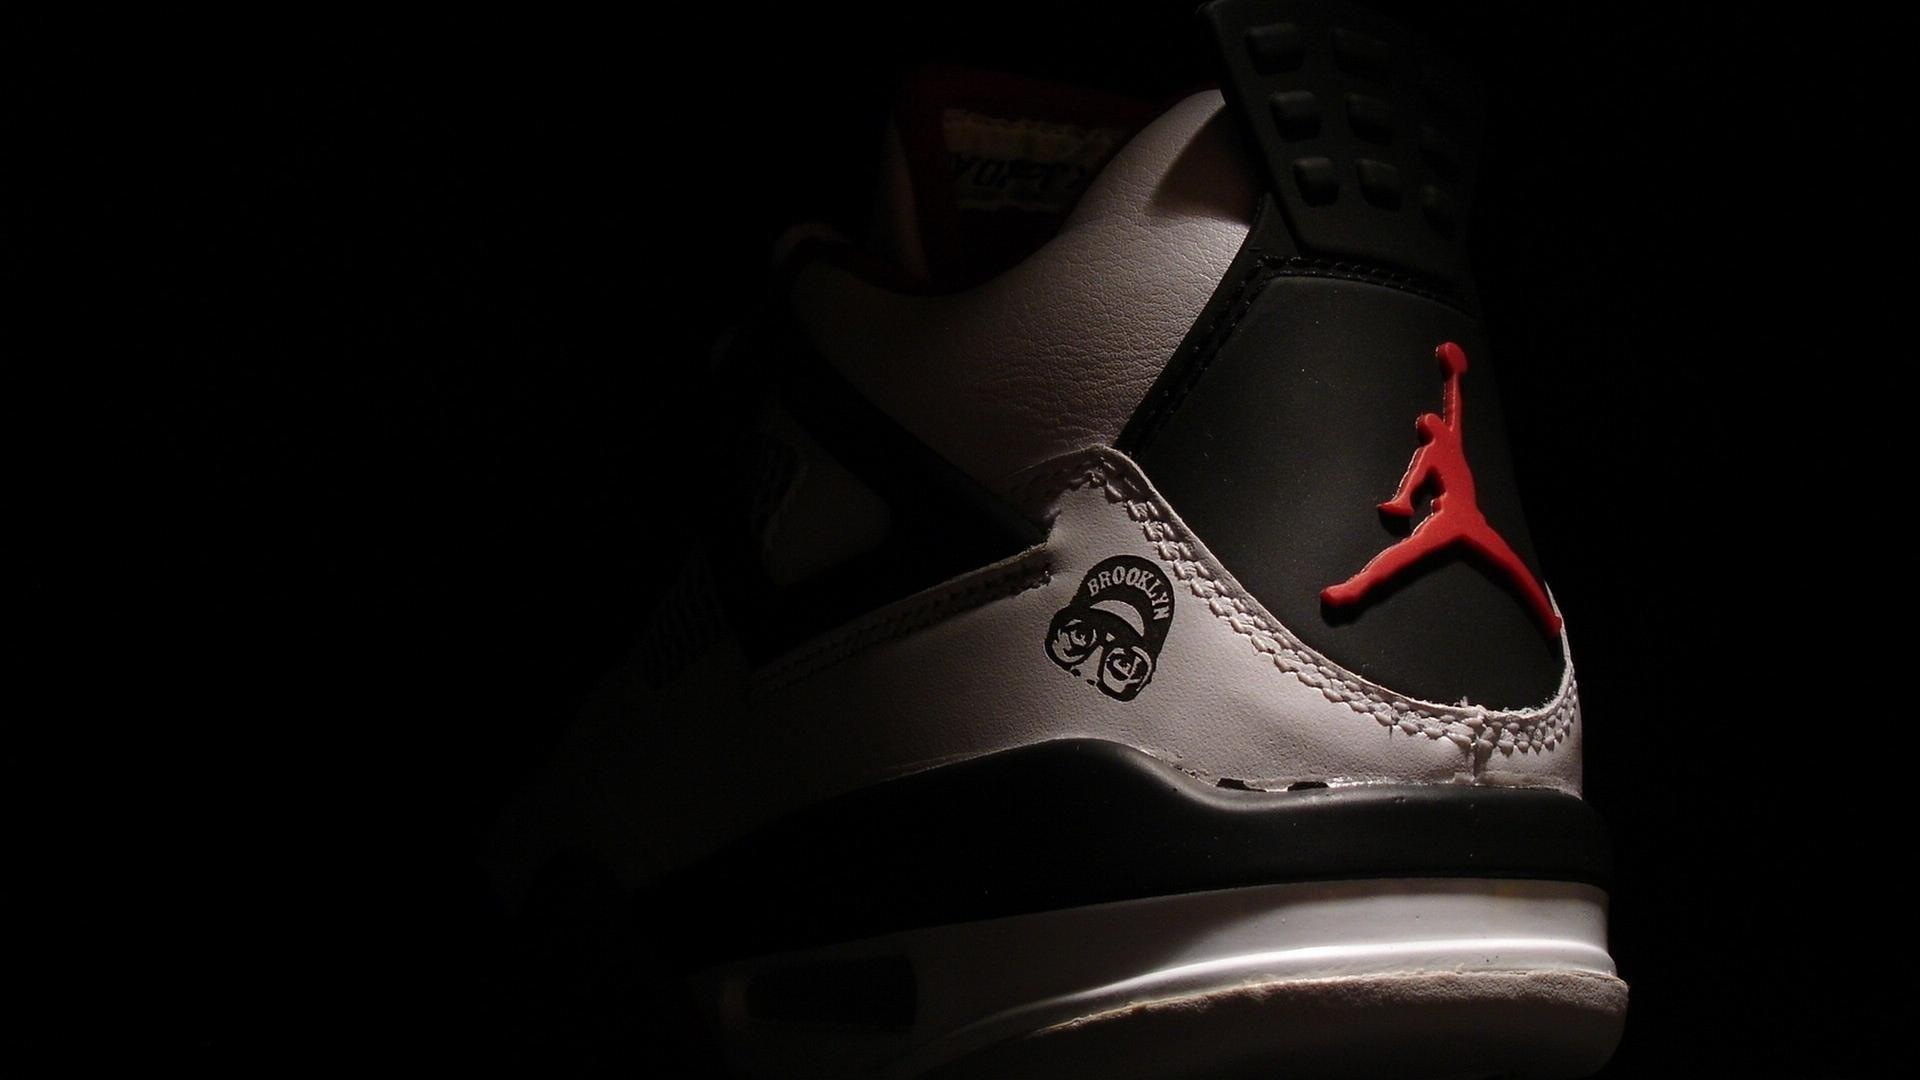 Jordan Shoe Wallpaper Fitness Pinterest Michael Jordan